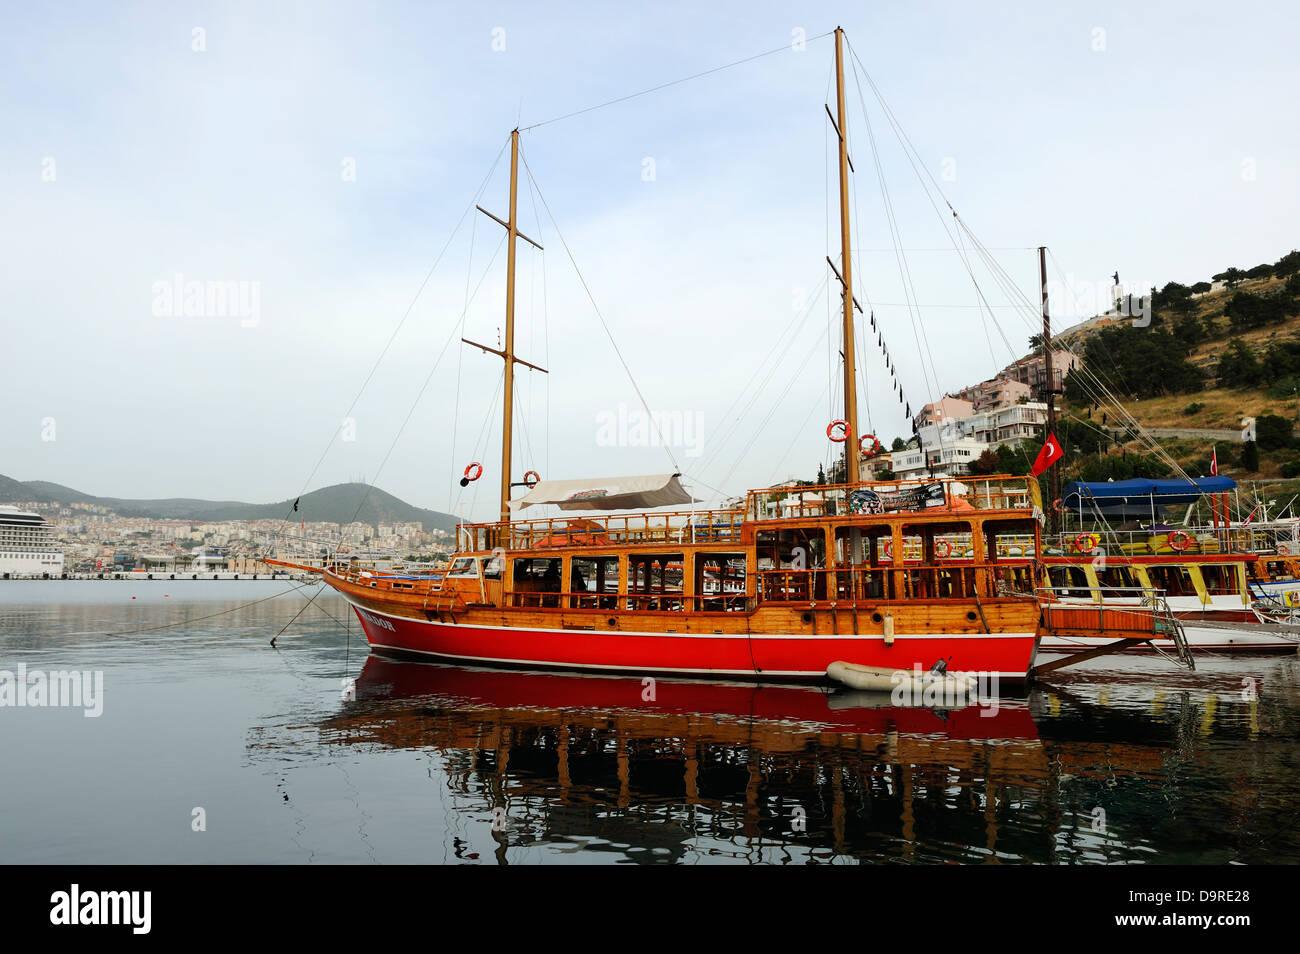 Charter boats at Kusadasi, Aegean Coast, Turkey - Stock Image